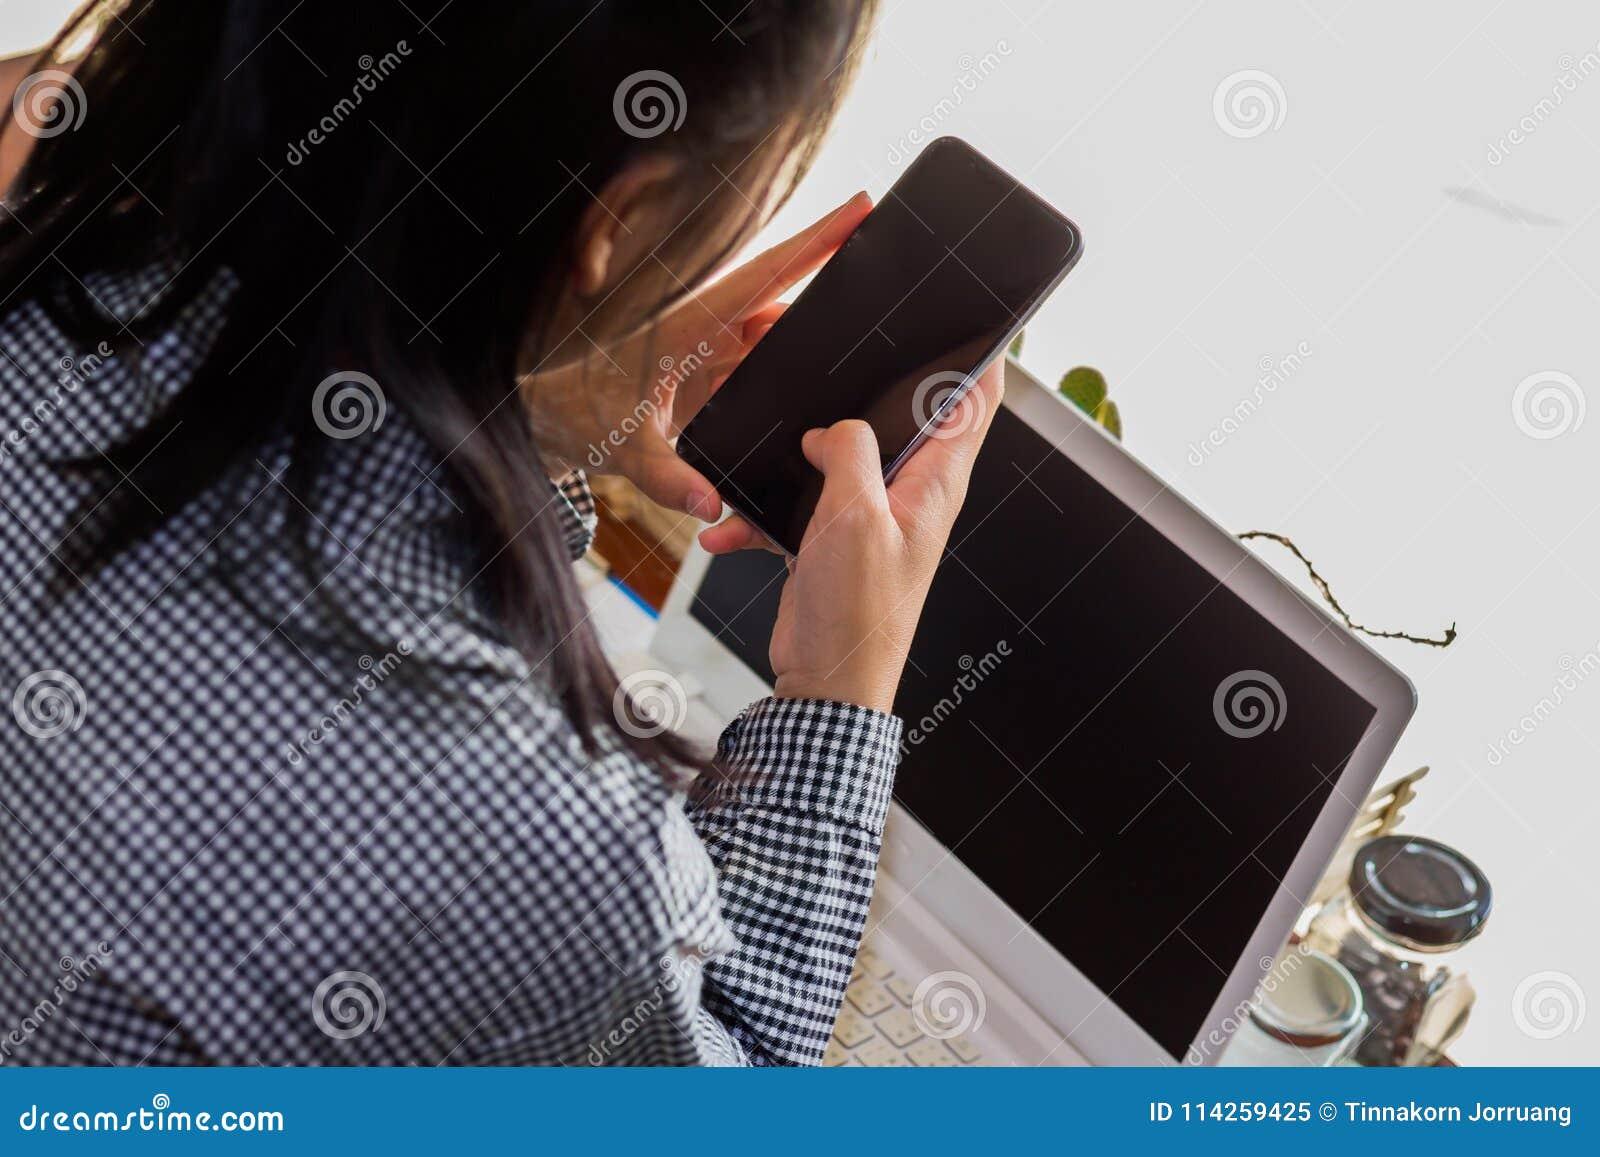 Businesswomen using cellphone working in coffee shop.